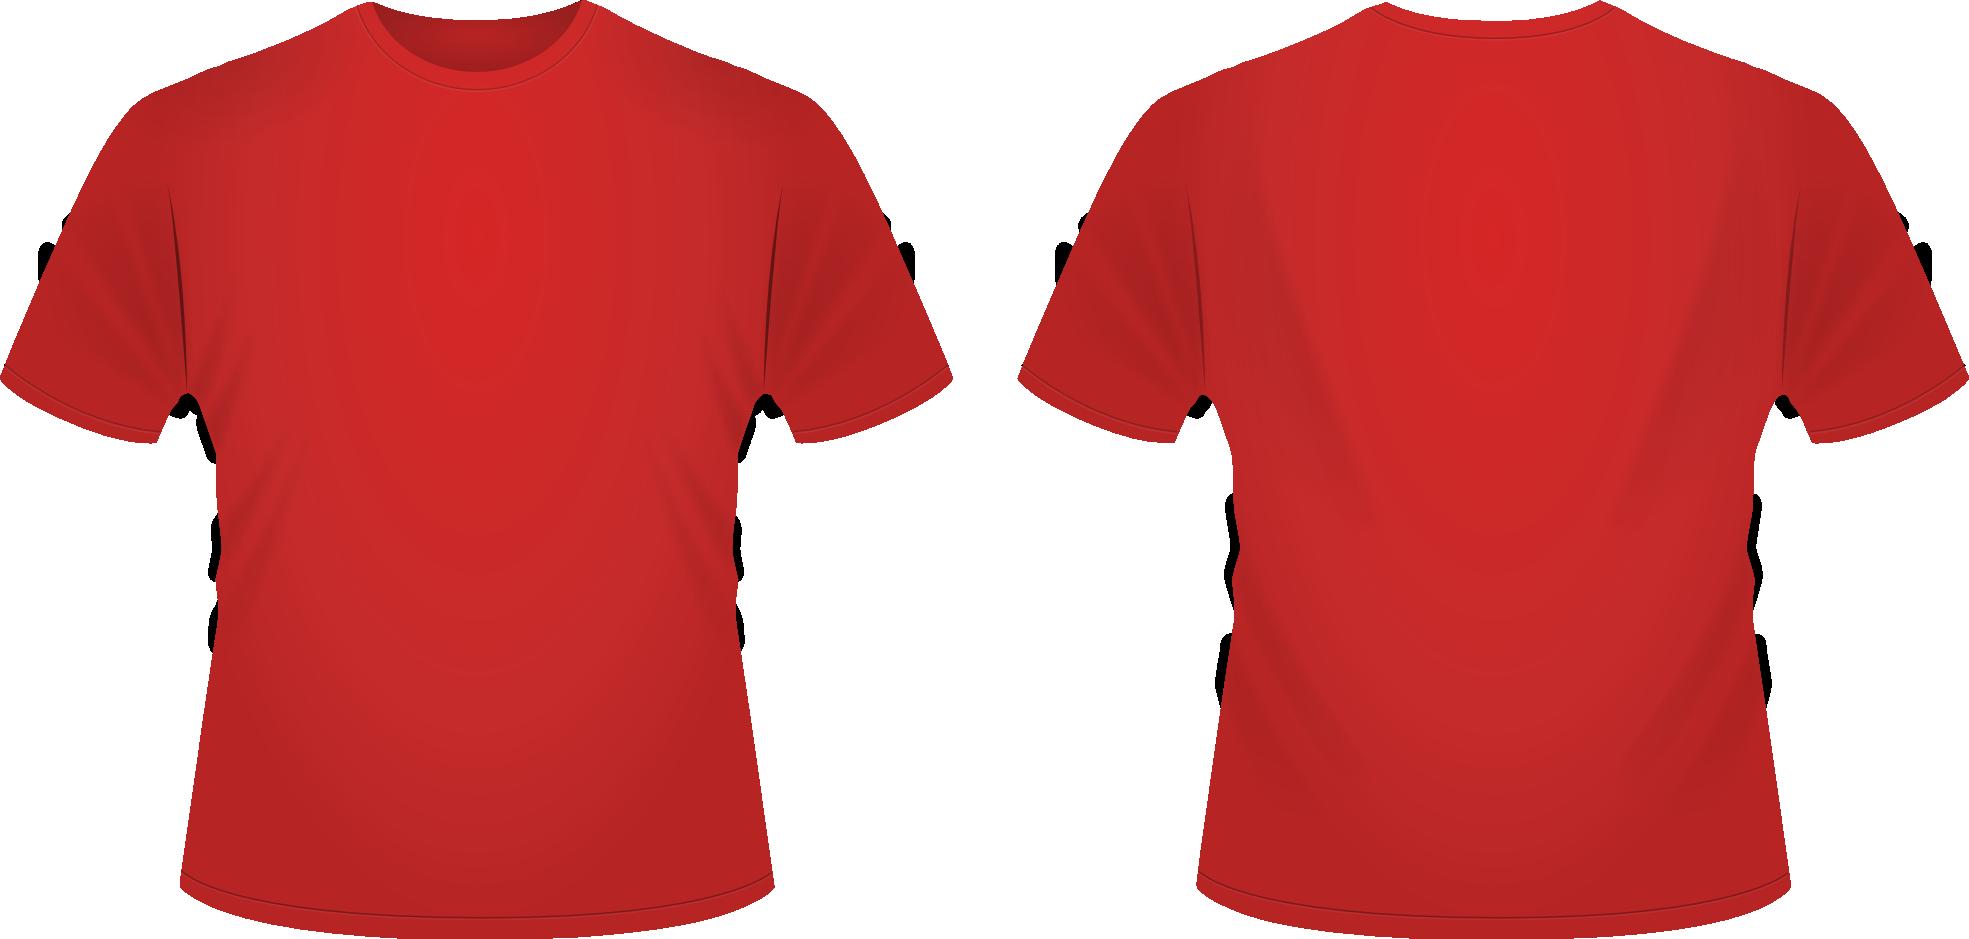 T Shirt SVG by DanRabbit